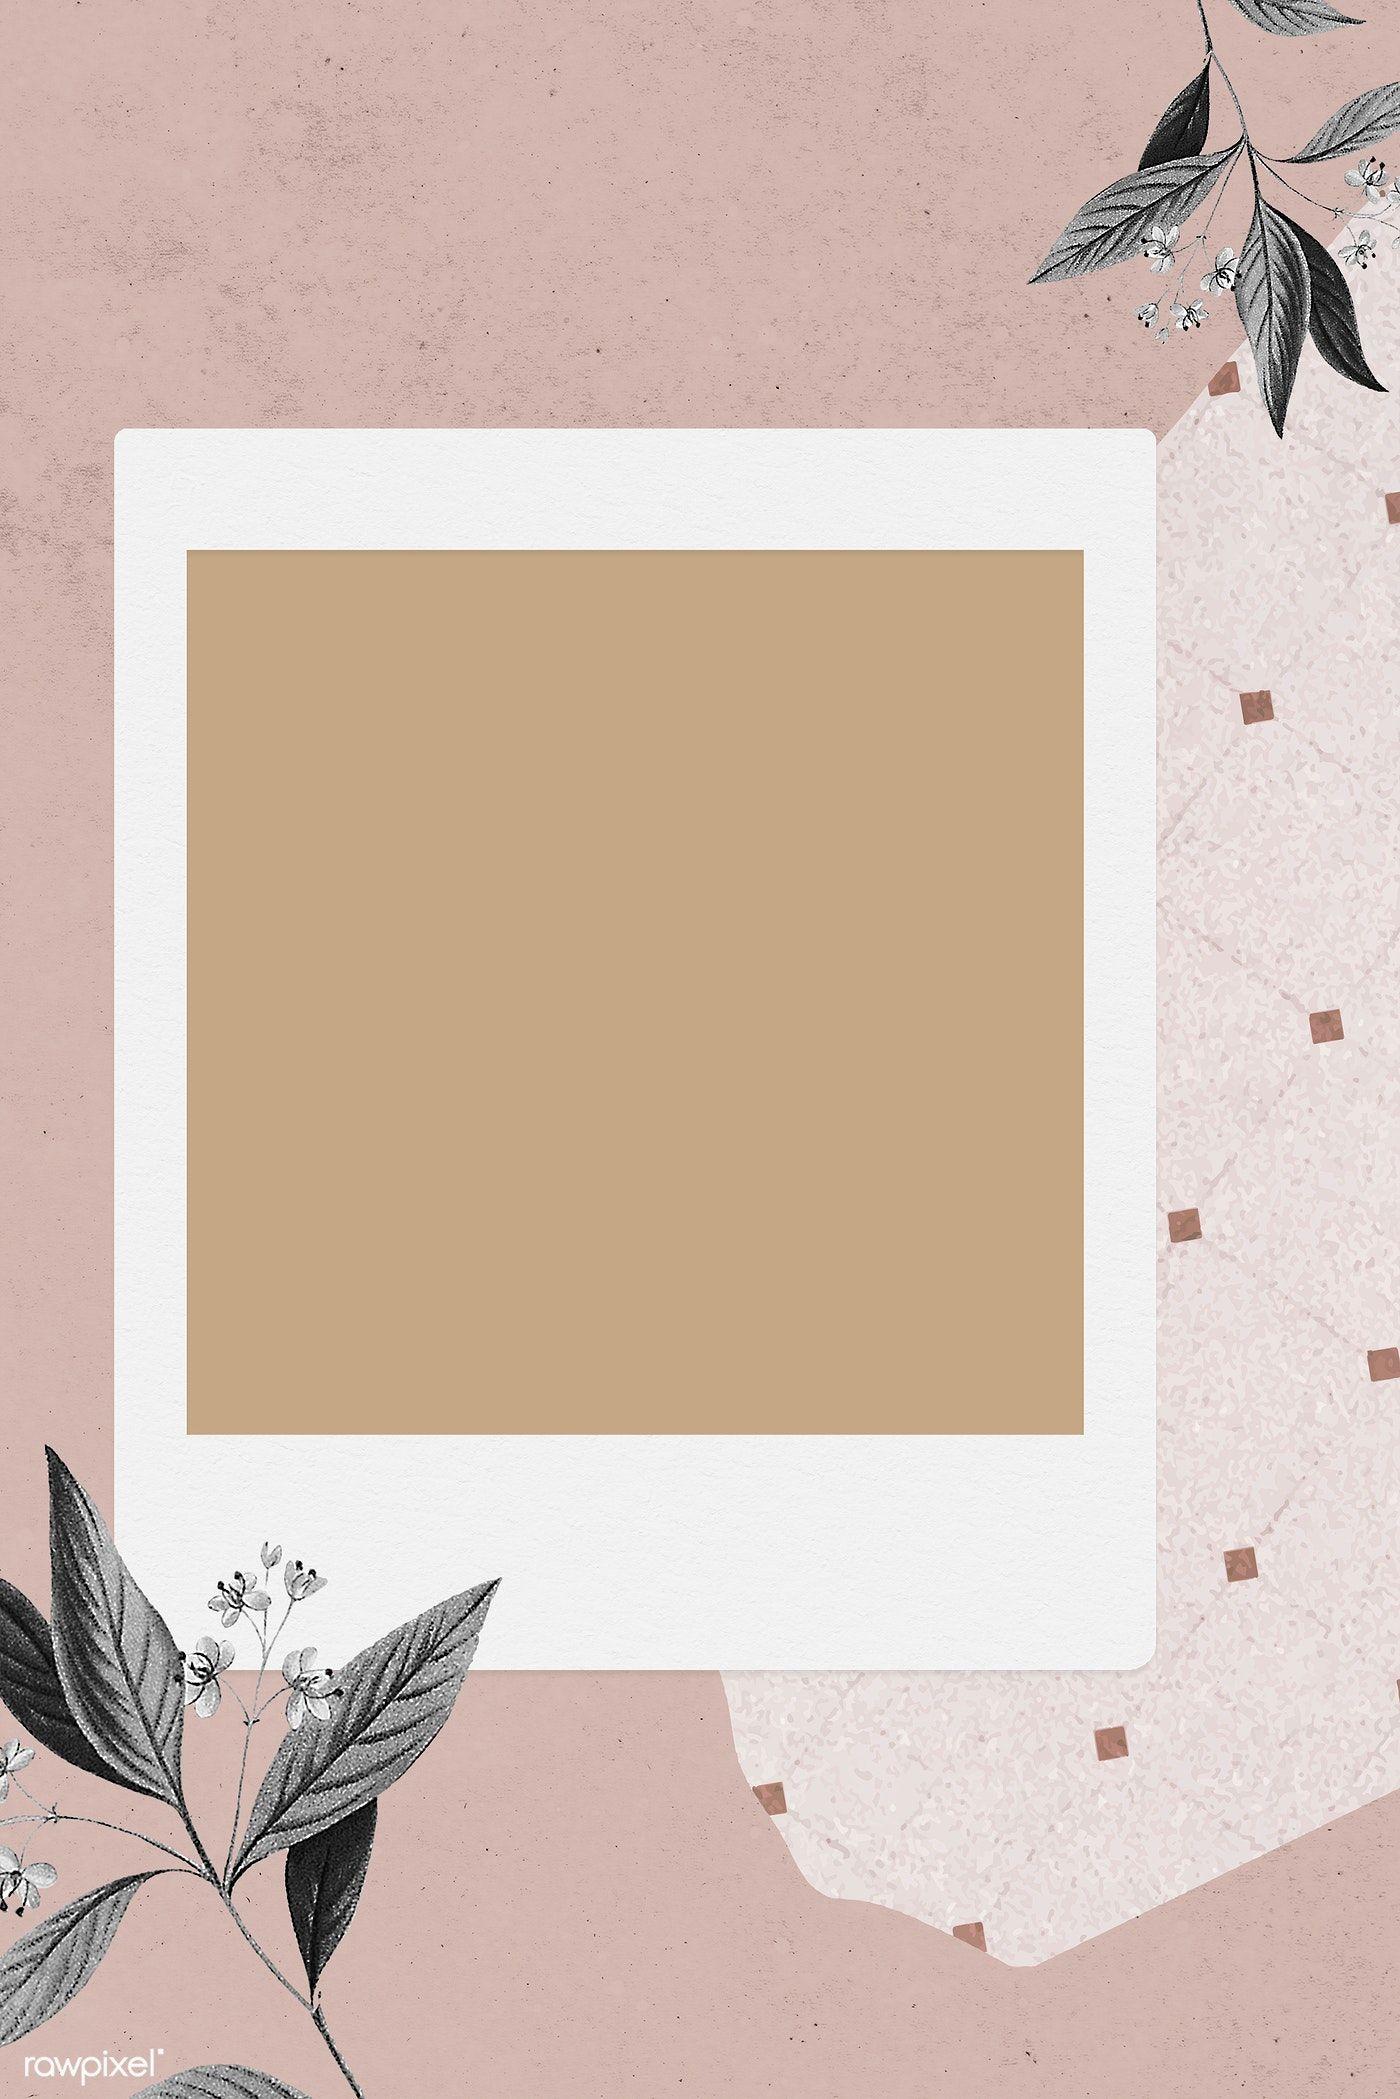 Download Premium Illustration Of Blank Collage Photo Frame Template On Instagram Frame Template Photo Collage Template Frame Template